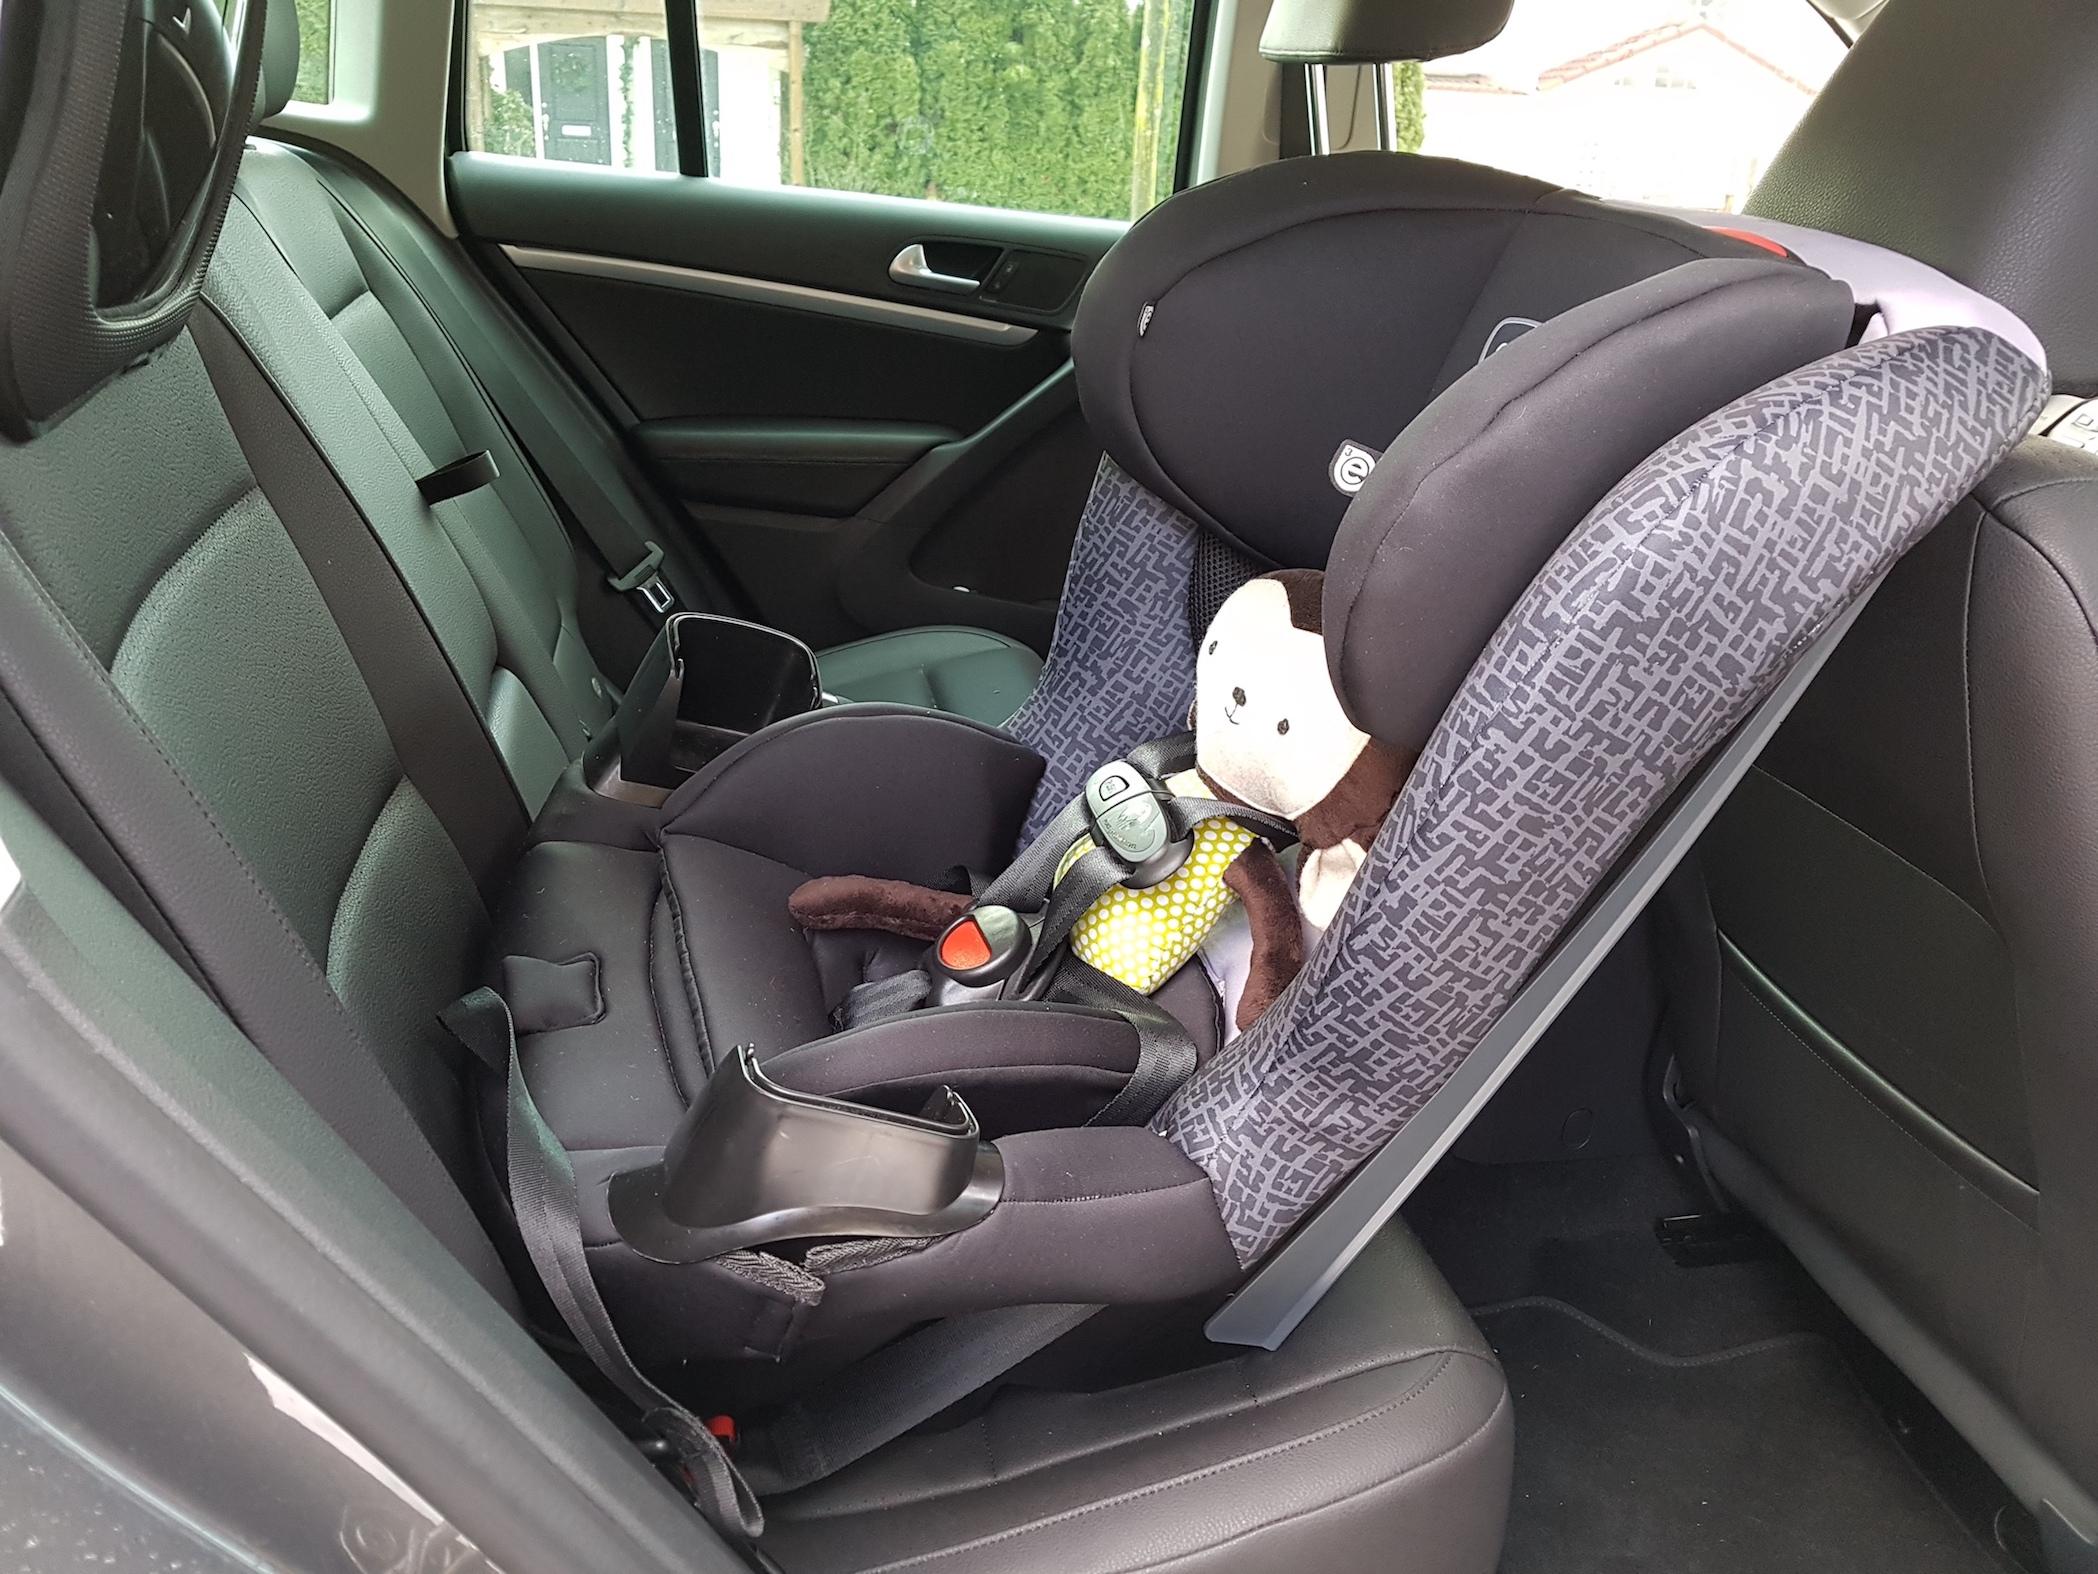 evevnflo_car_seat_bby_car